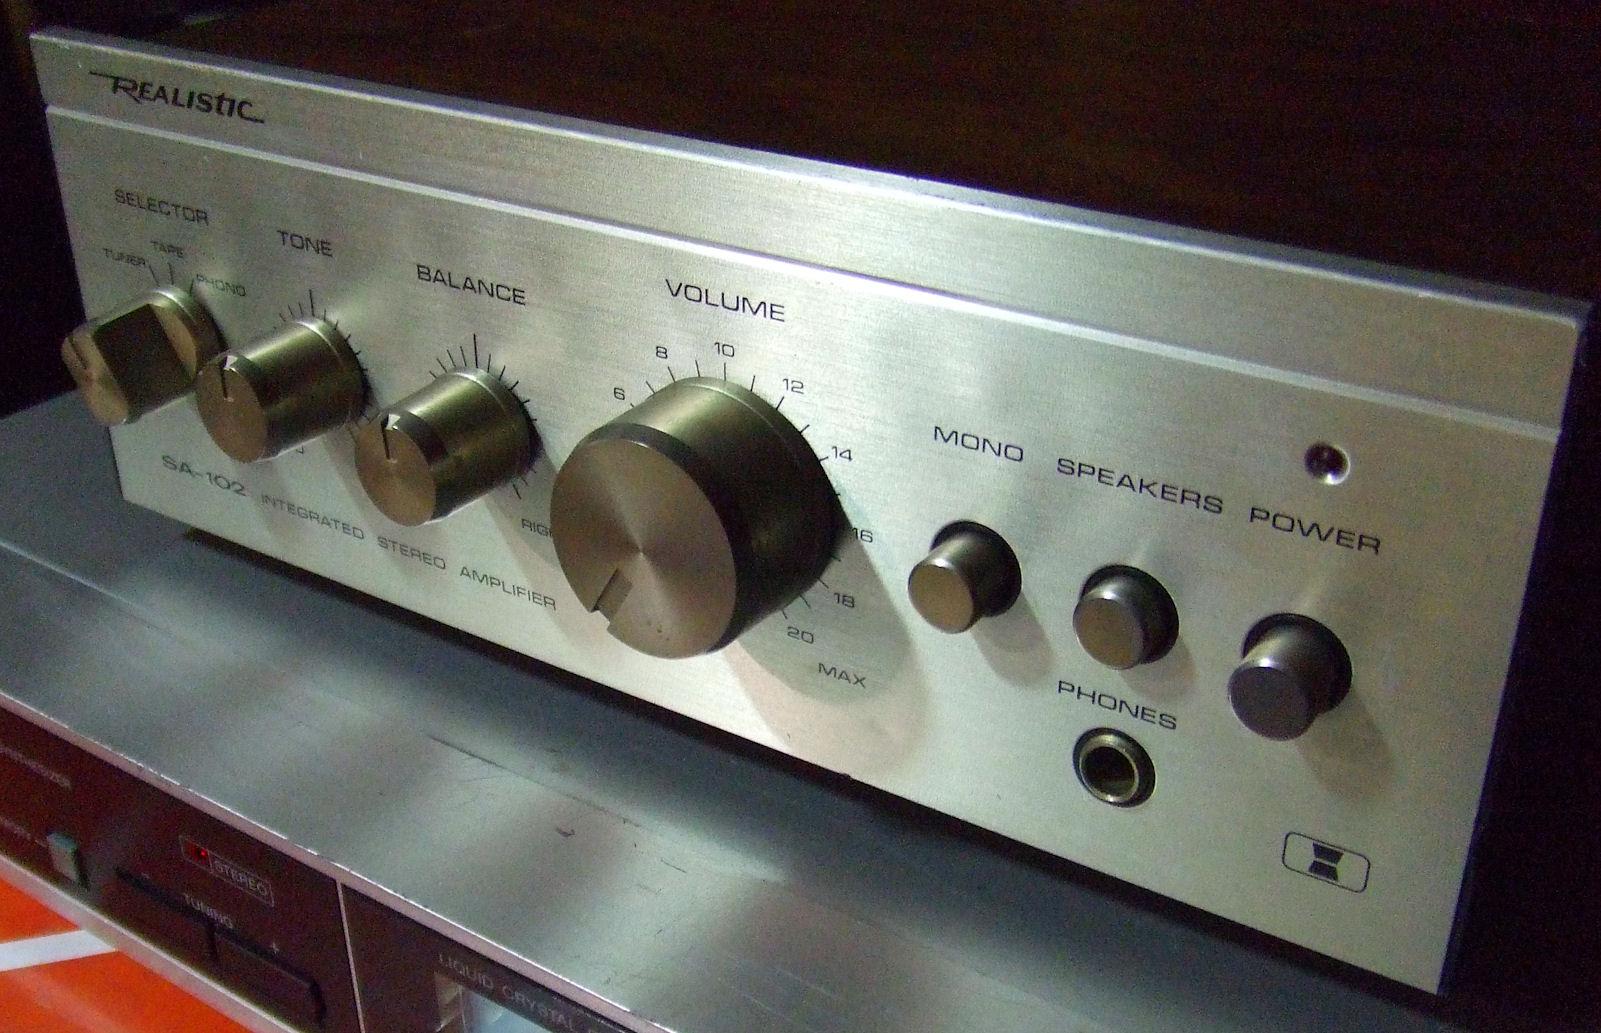 luxman audio products. Black Bedroom Furniture Sets. Home Design Ideas